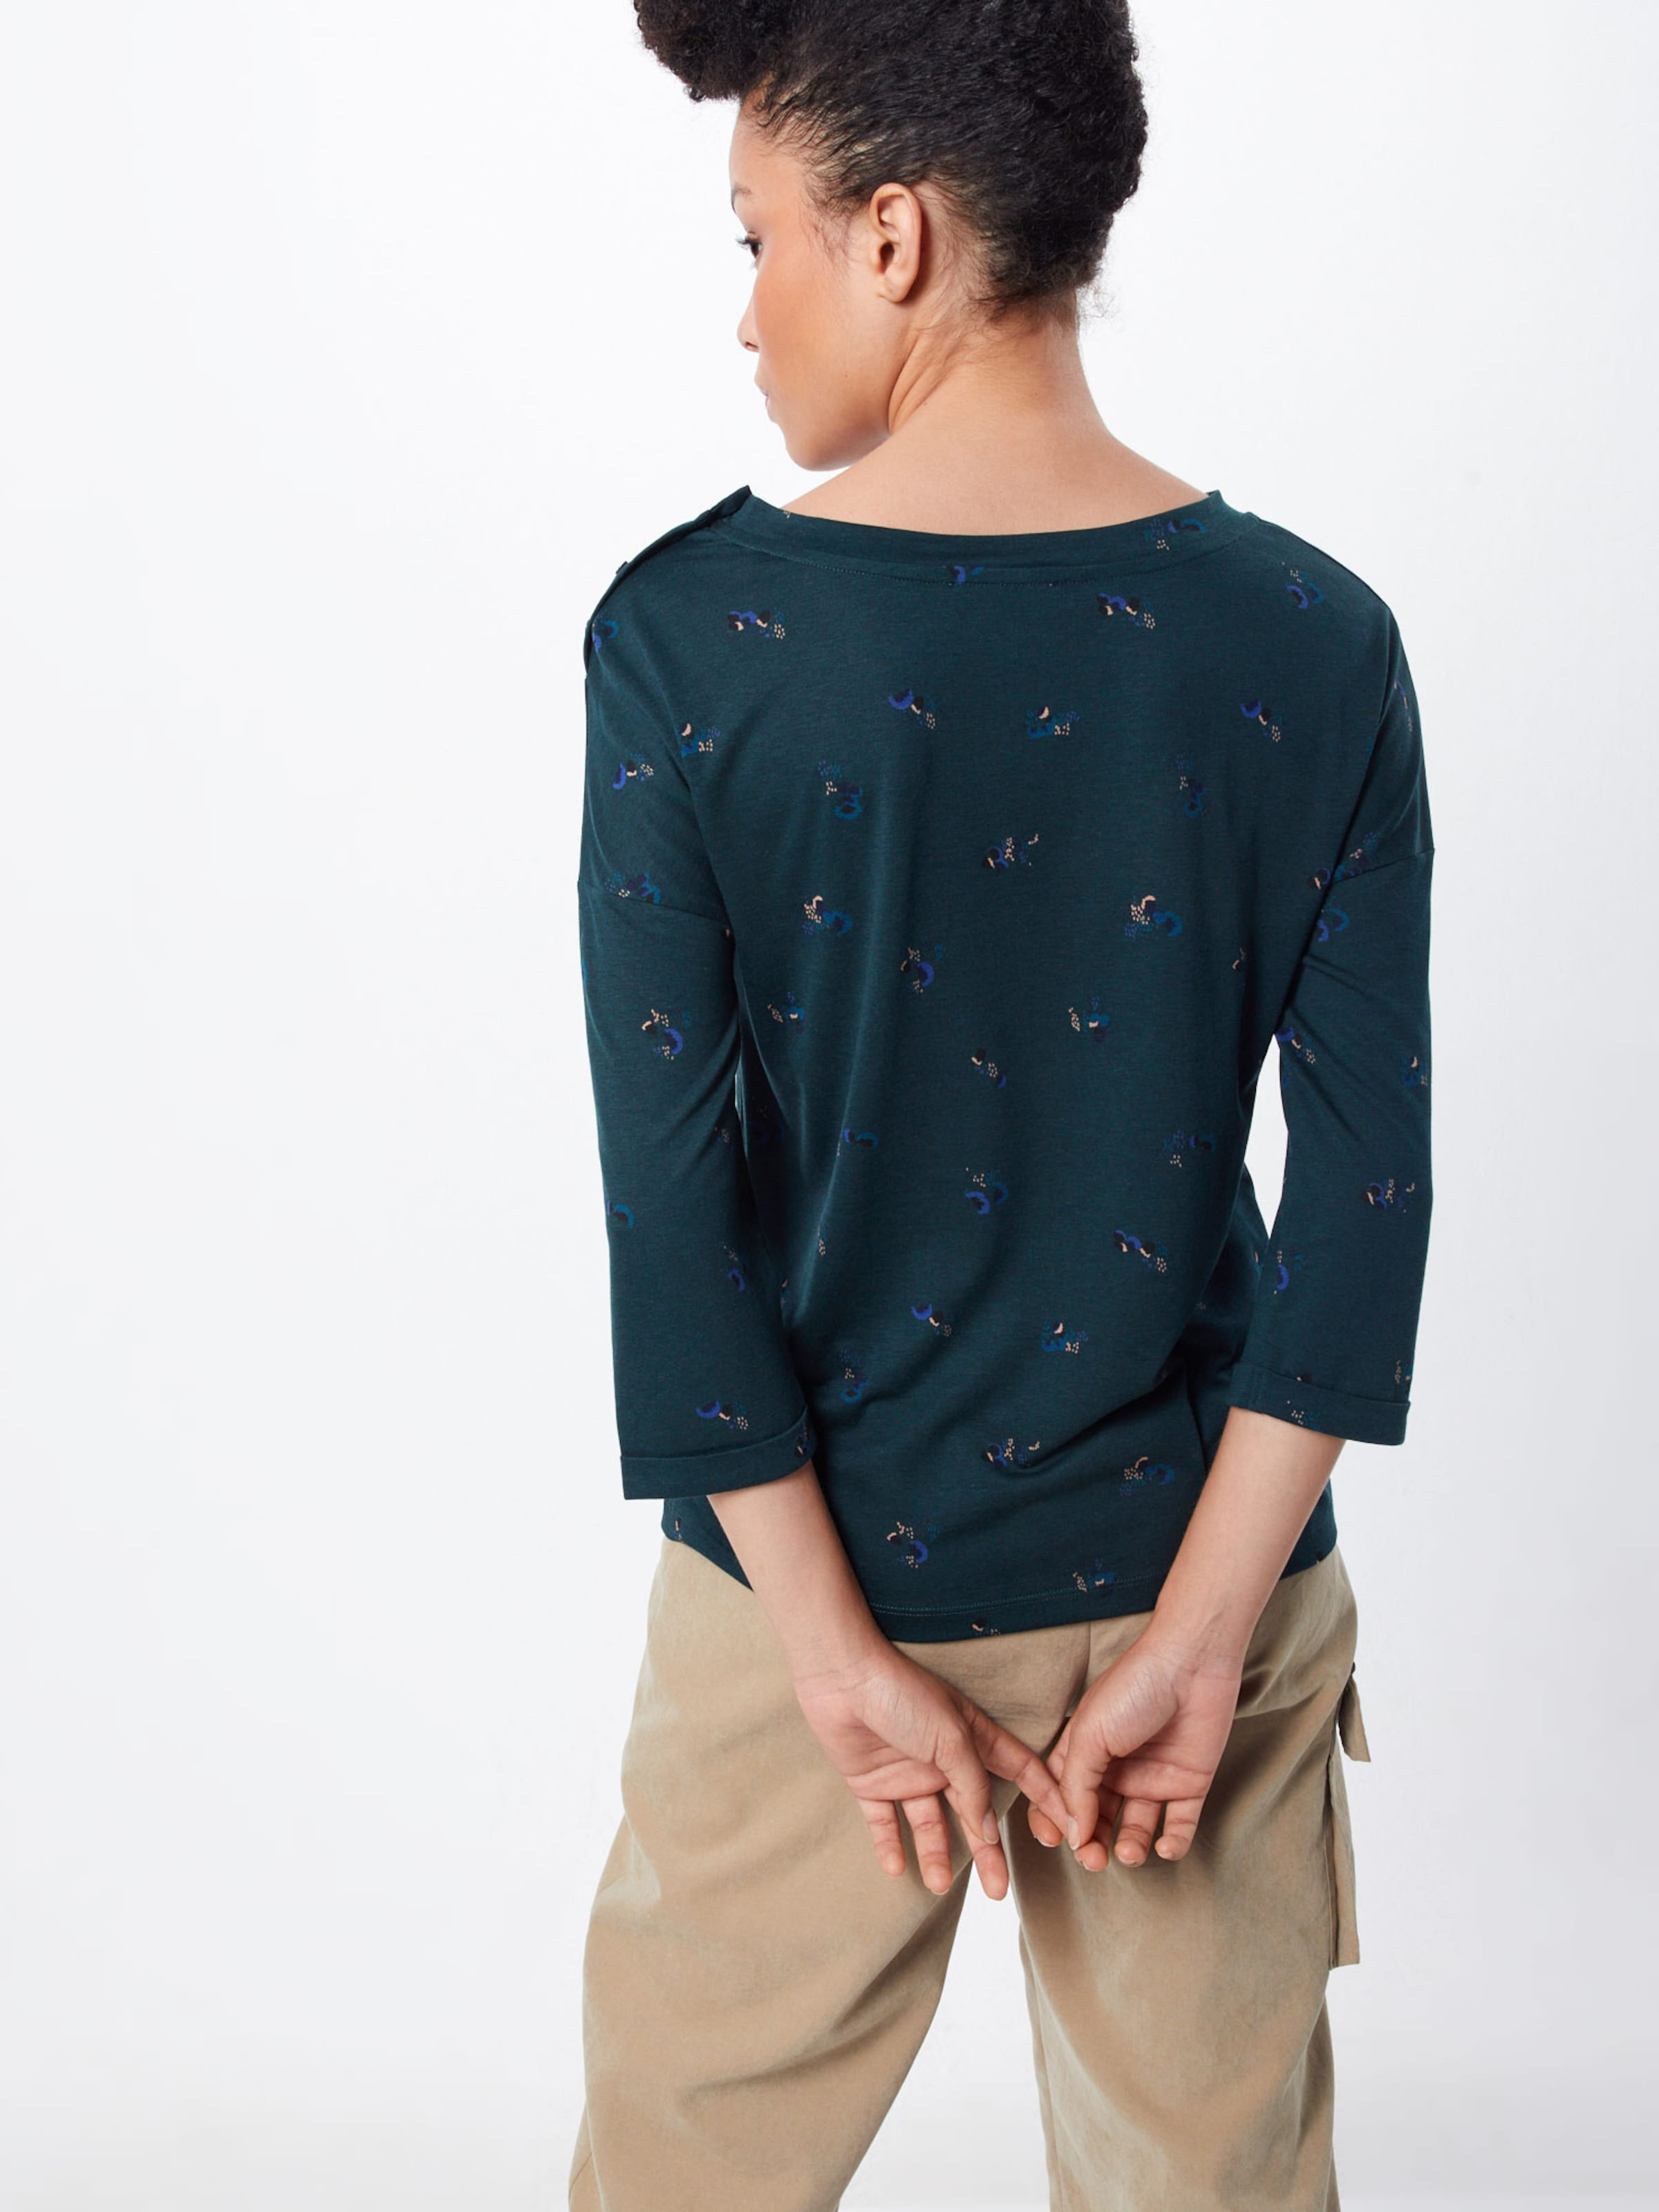 19 T Pétrole En shirt 'devon 2' Sessun OPXuTkiwZ